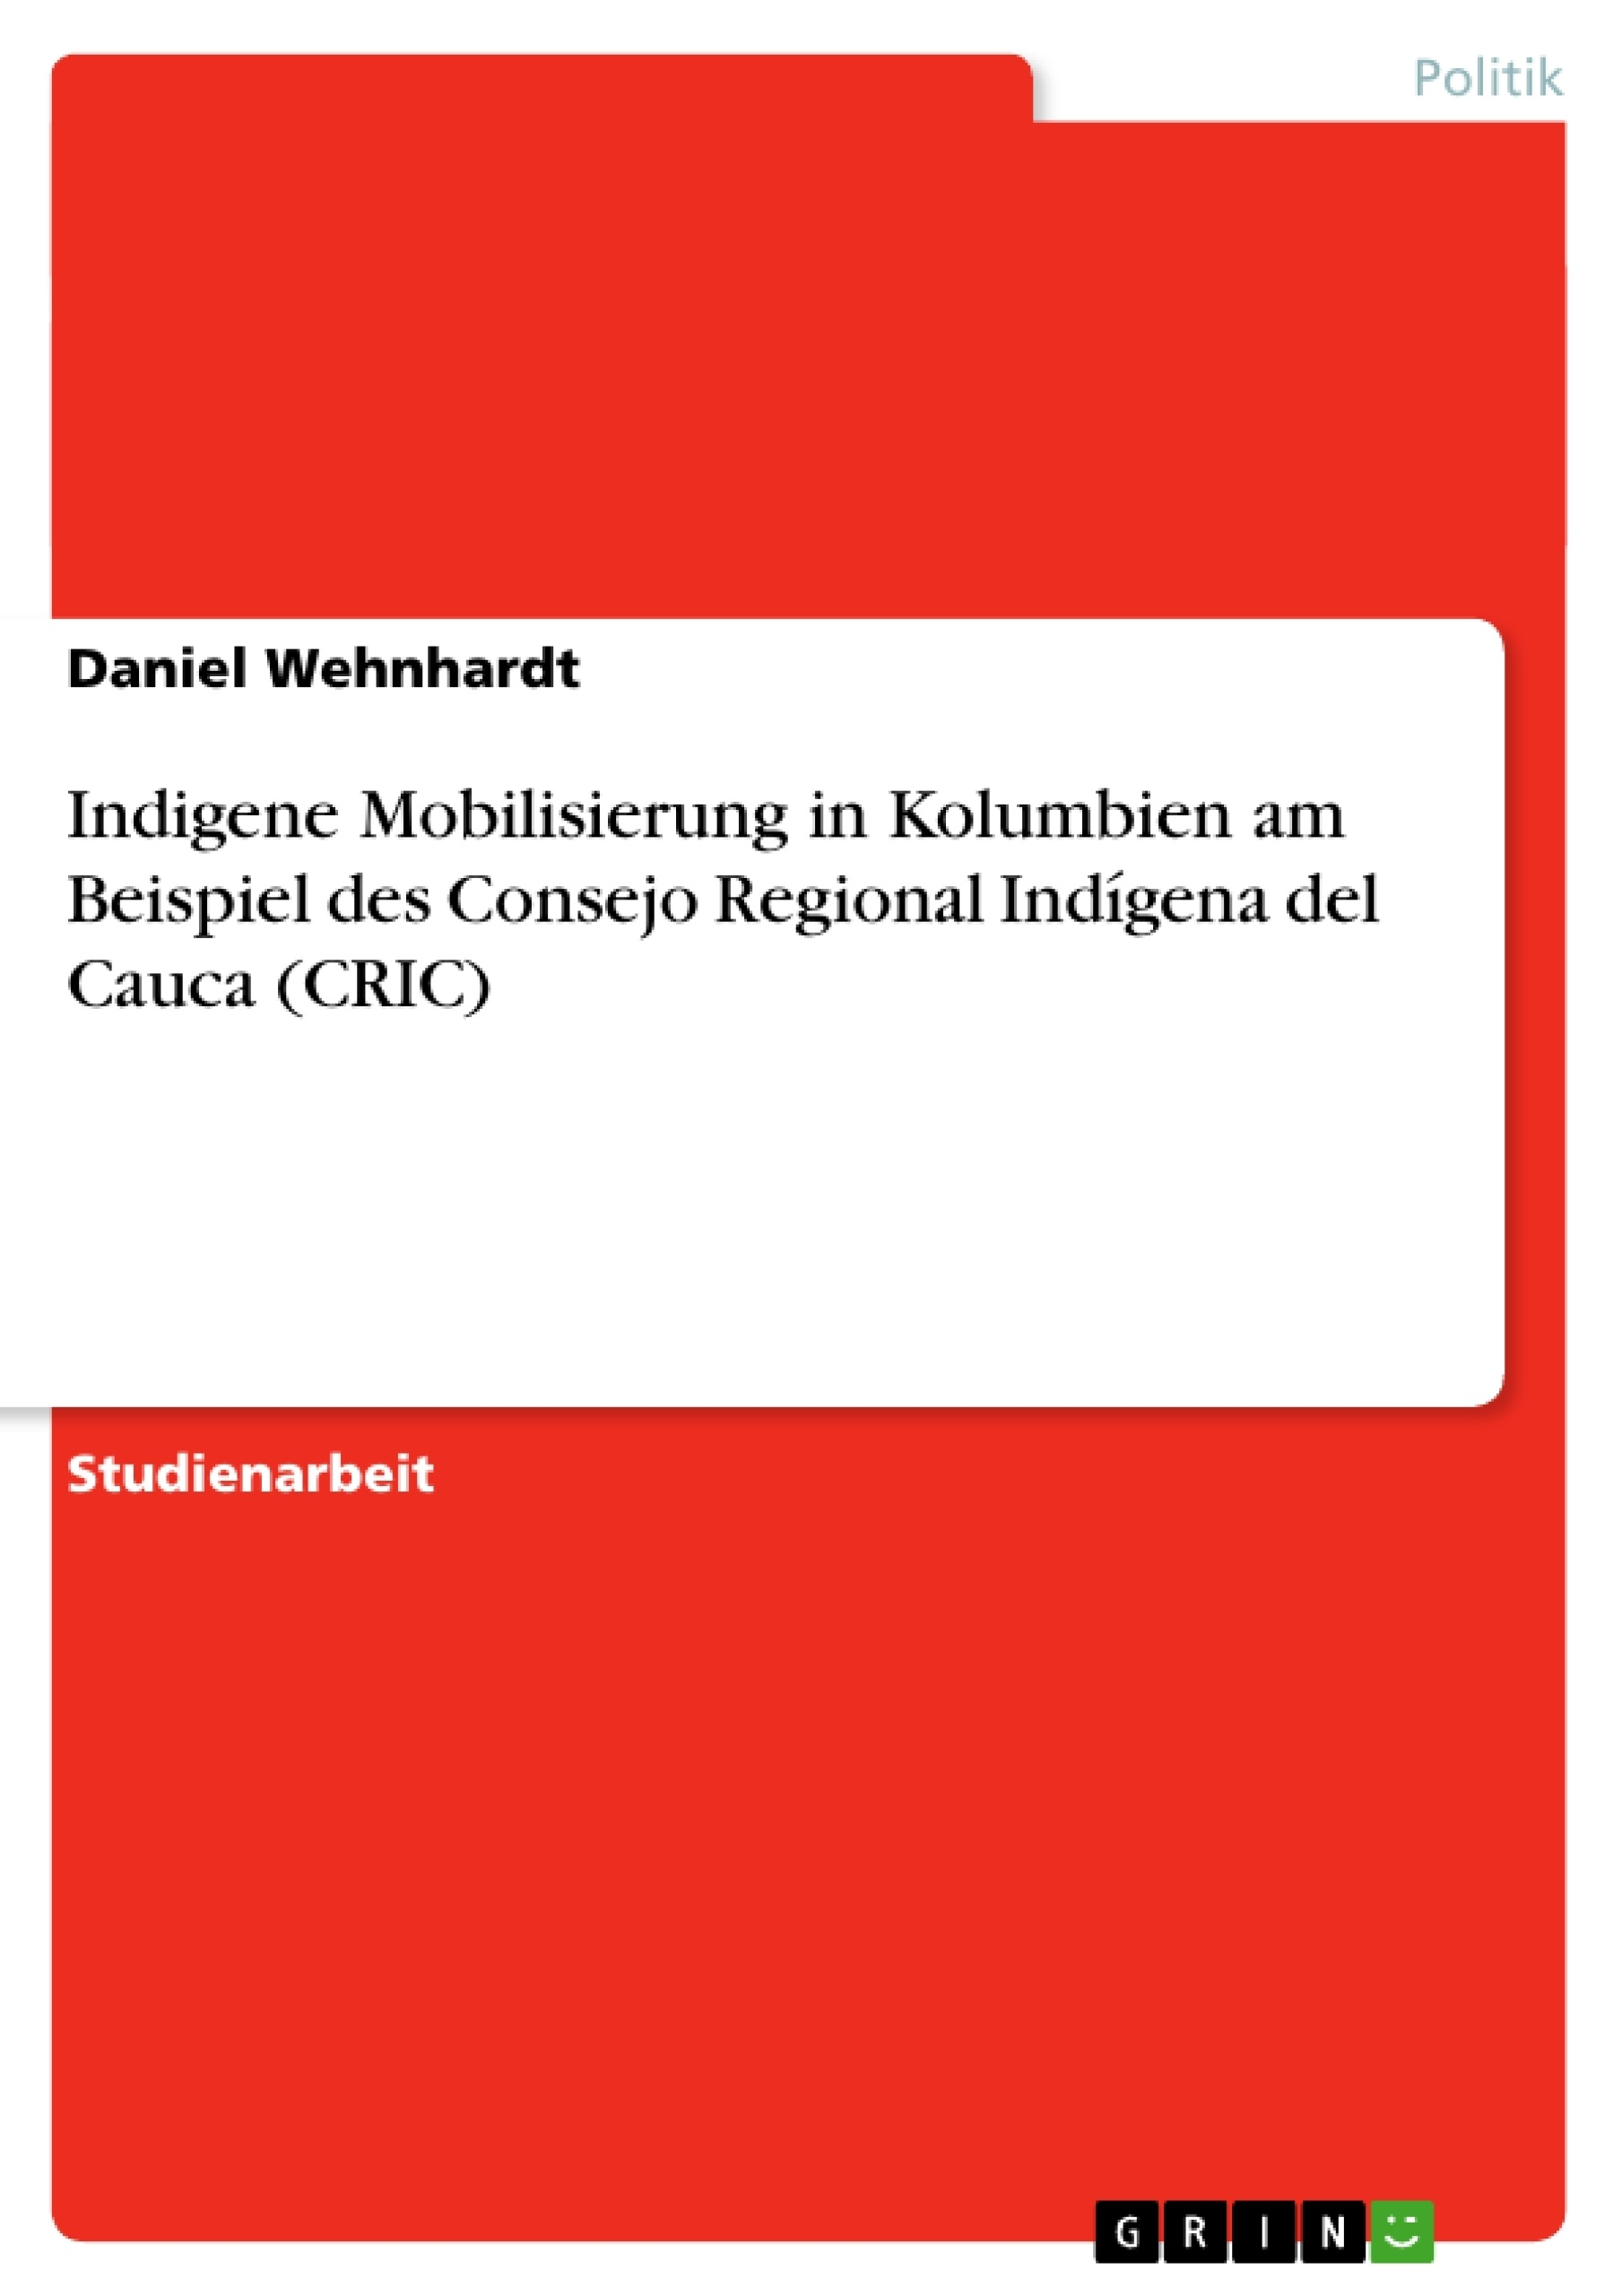 Titel: Indigene Mobilisierung in Kolumbien am Beispiel des Consejo Regional Indígena del Cauca (CRIC)